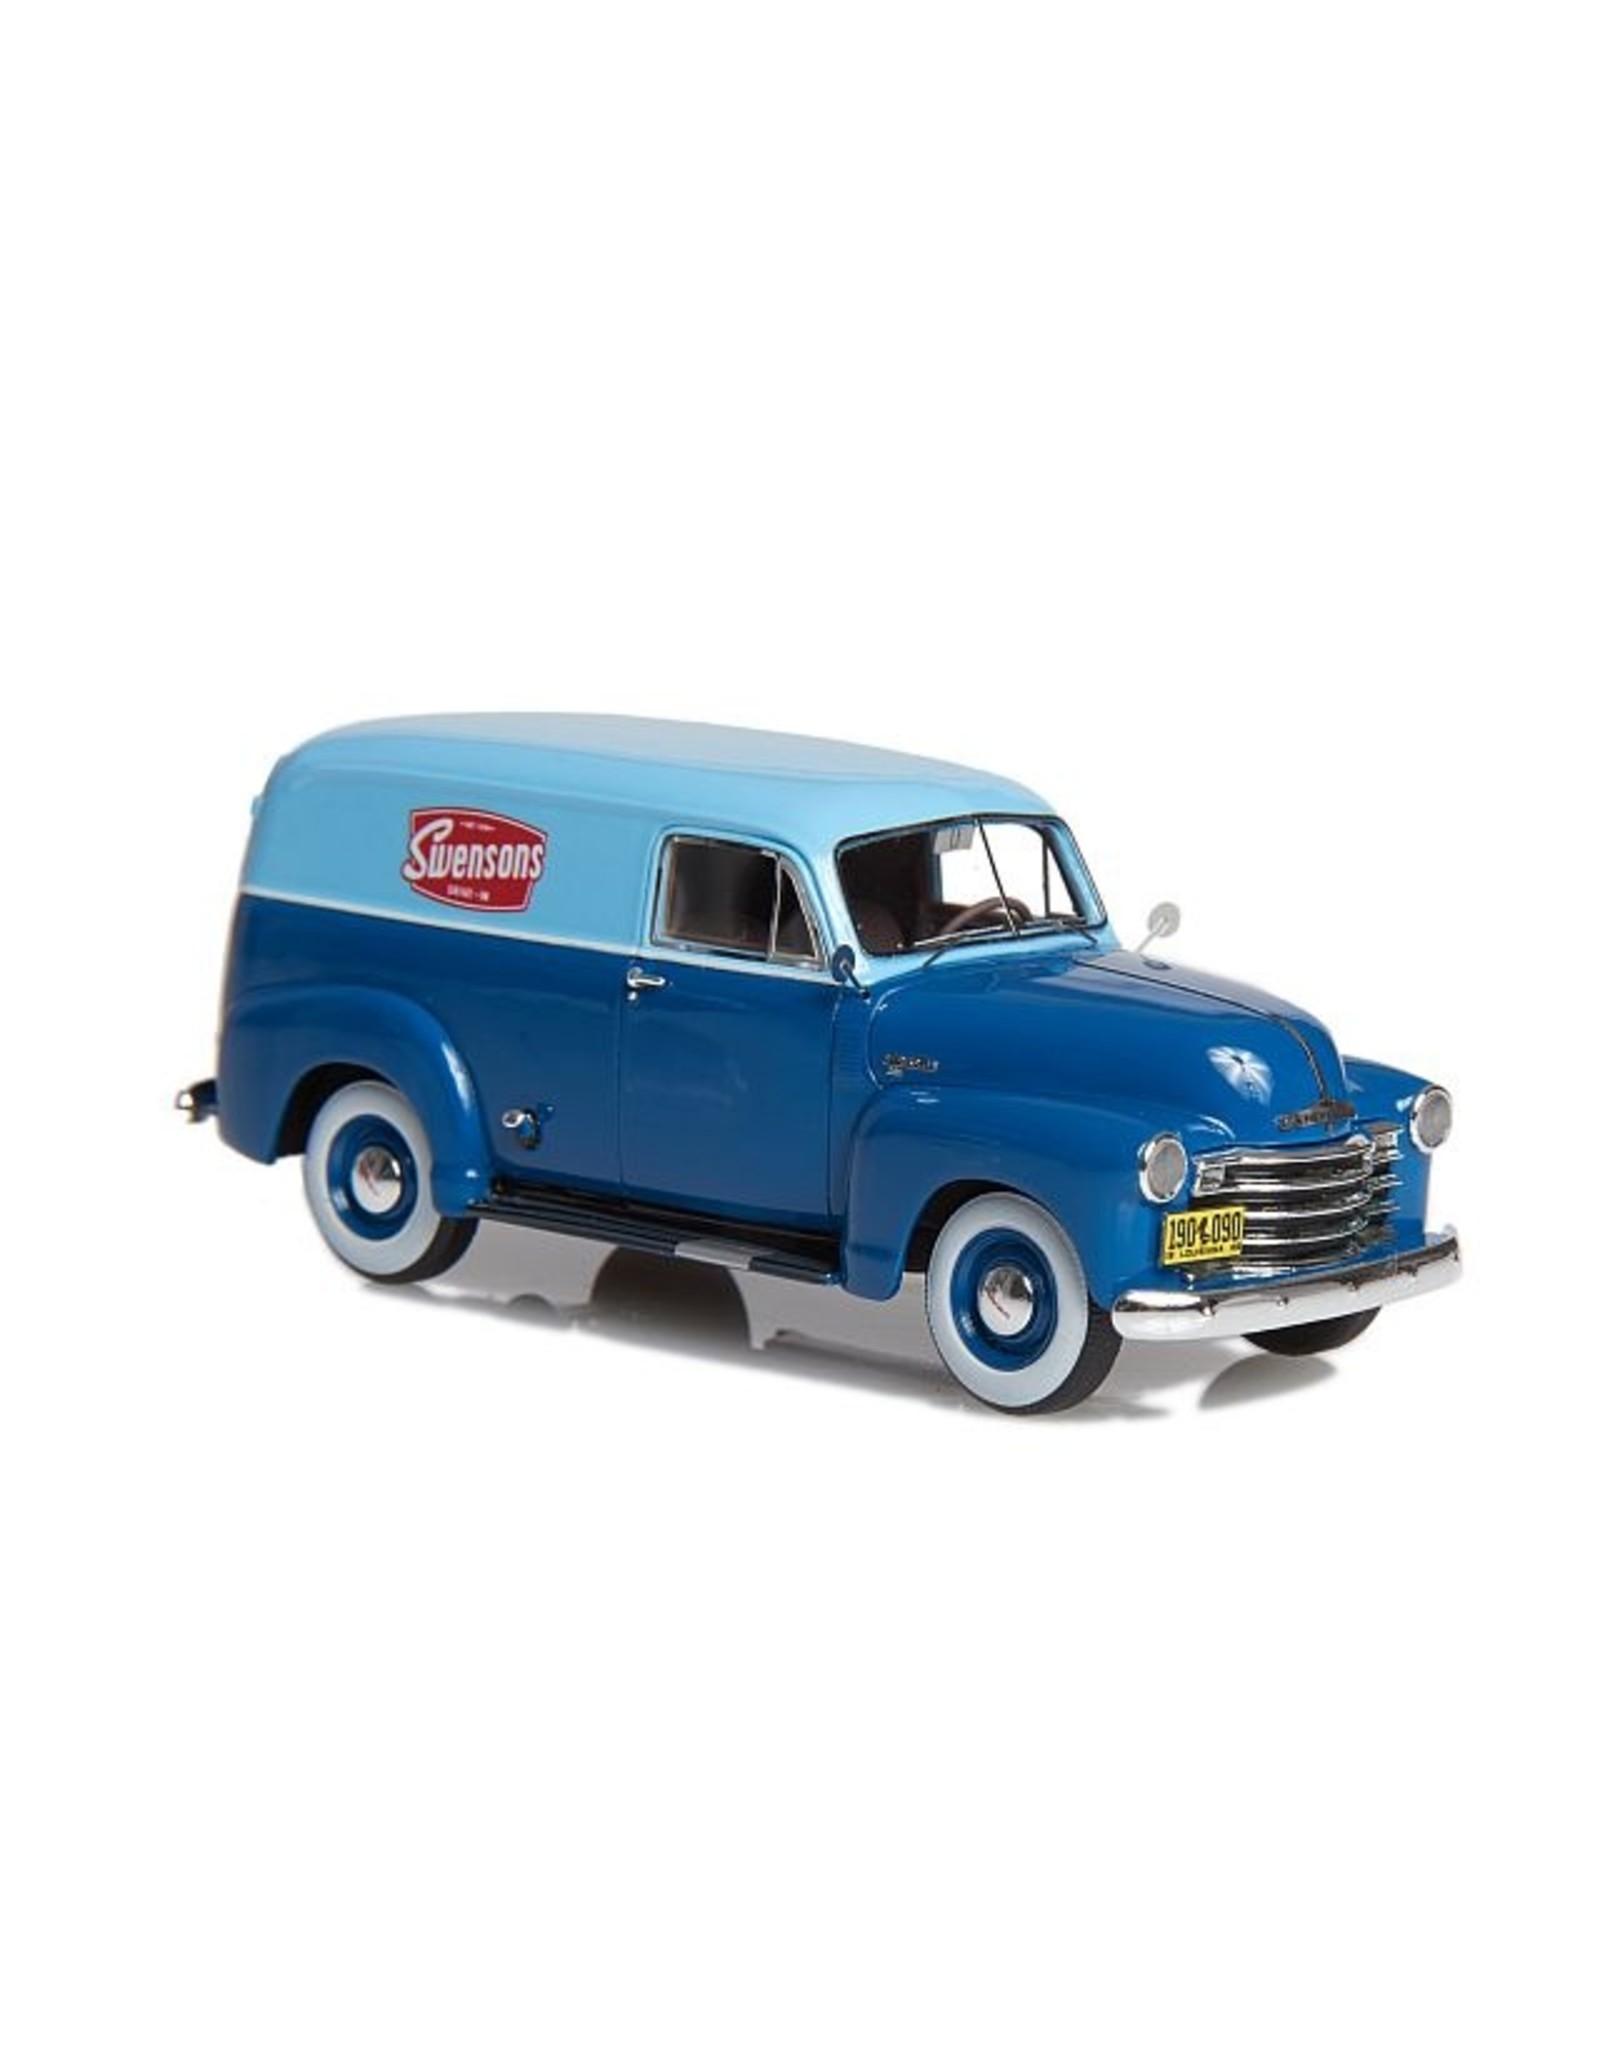 Chevrolet CHEVROLET 3100 DELIVERY VAN(1949-53)dark blue/blue.